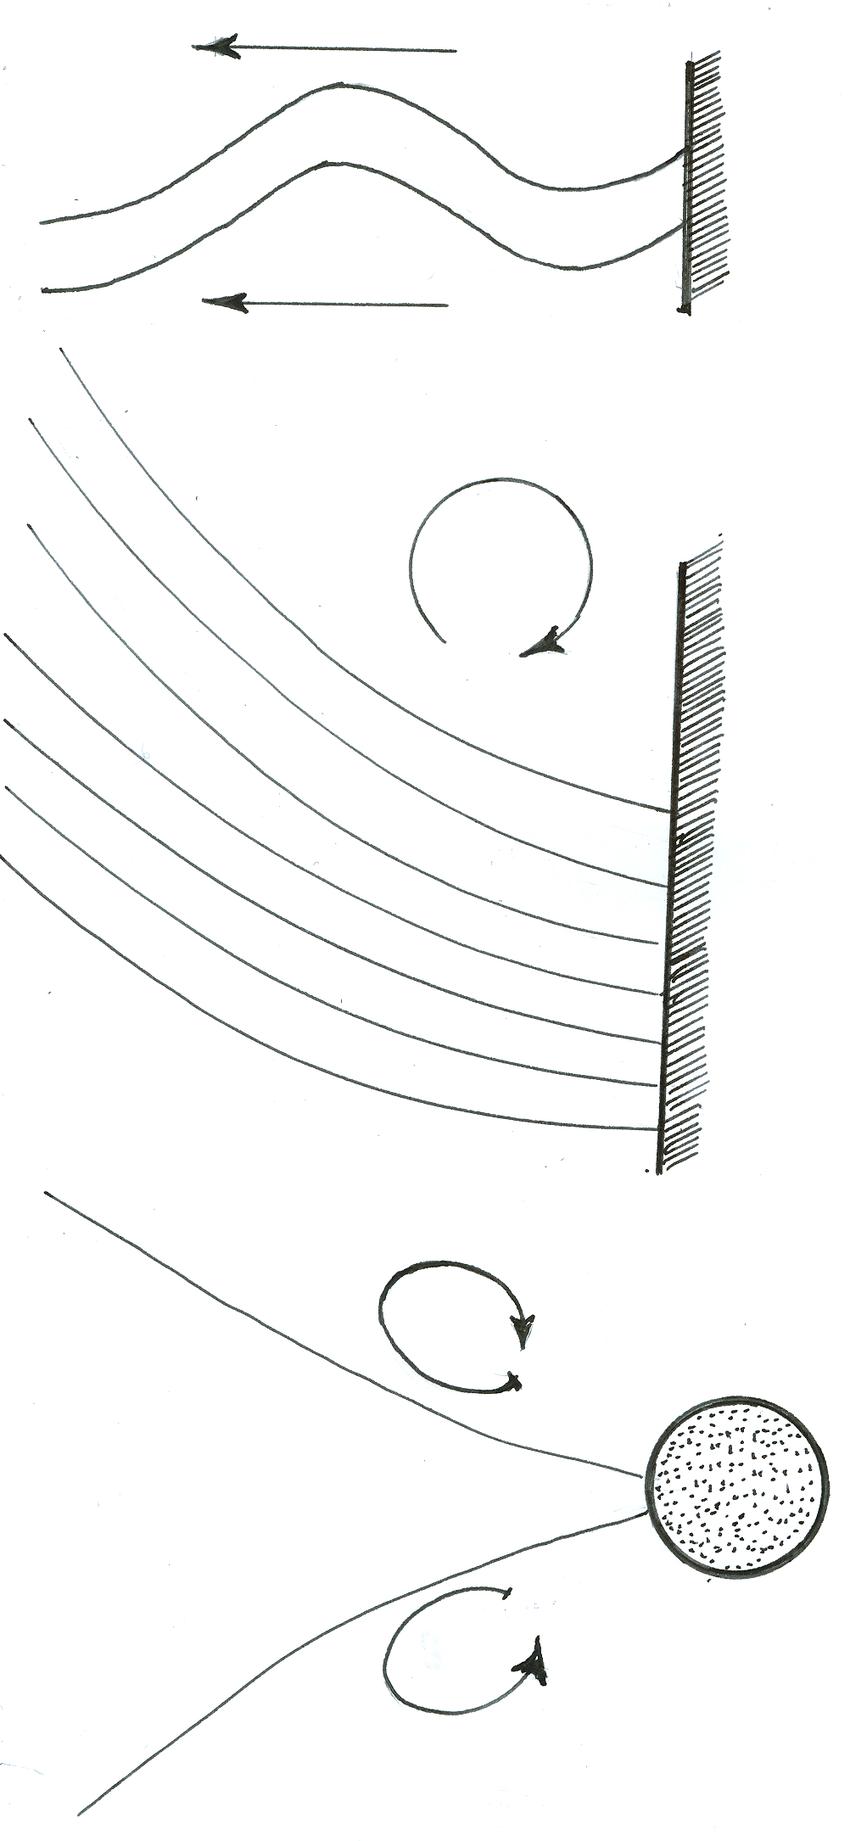 medium resolution of a variety of flagellar beating patterns a breaststroke of the biflagellate chlamydomonas